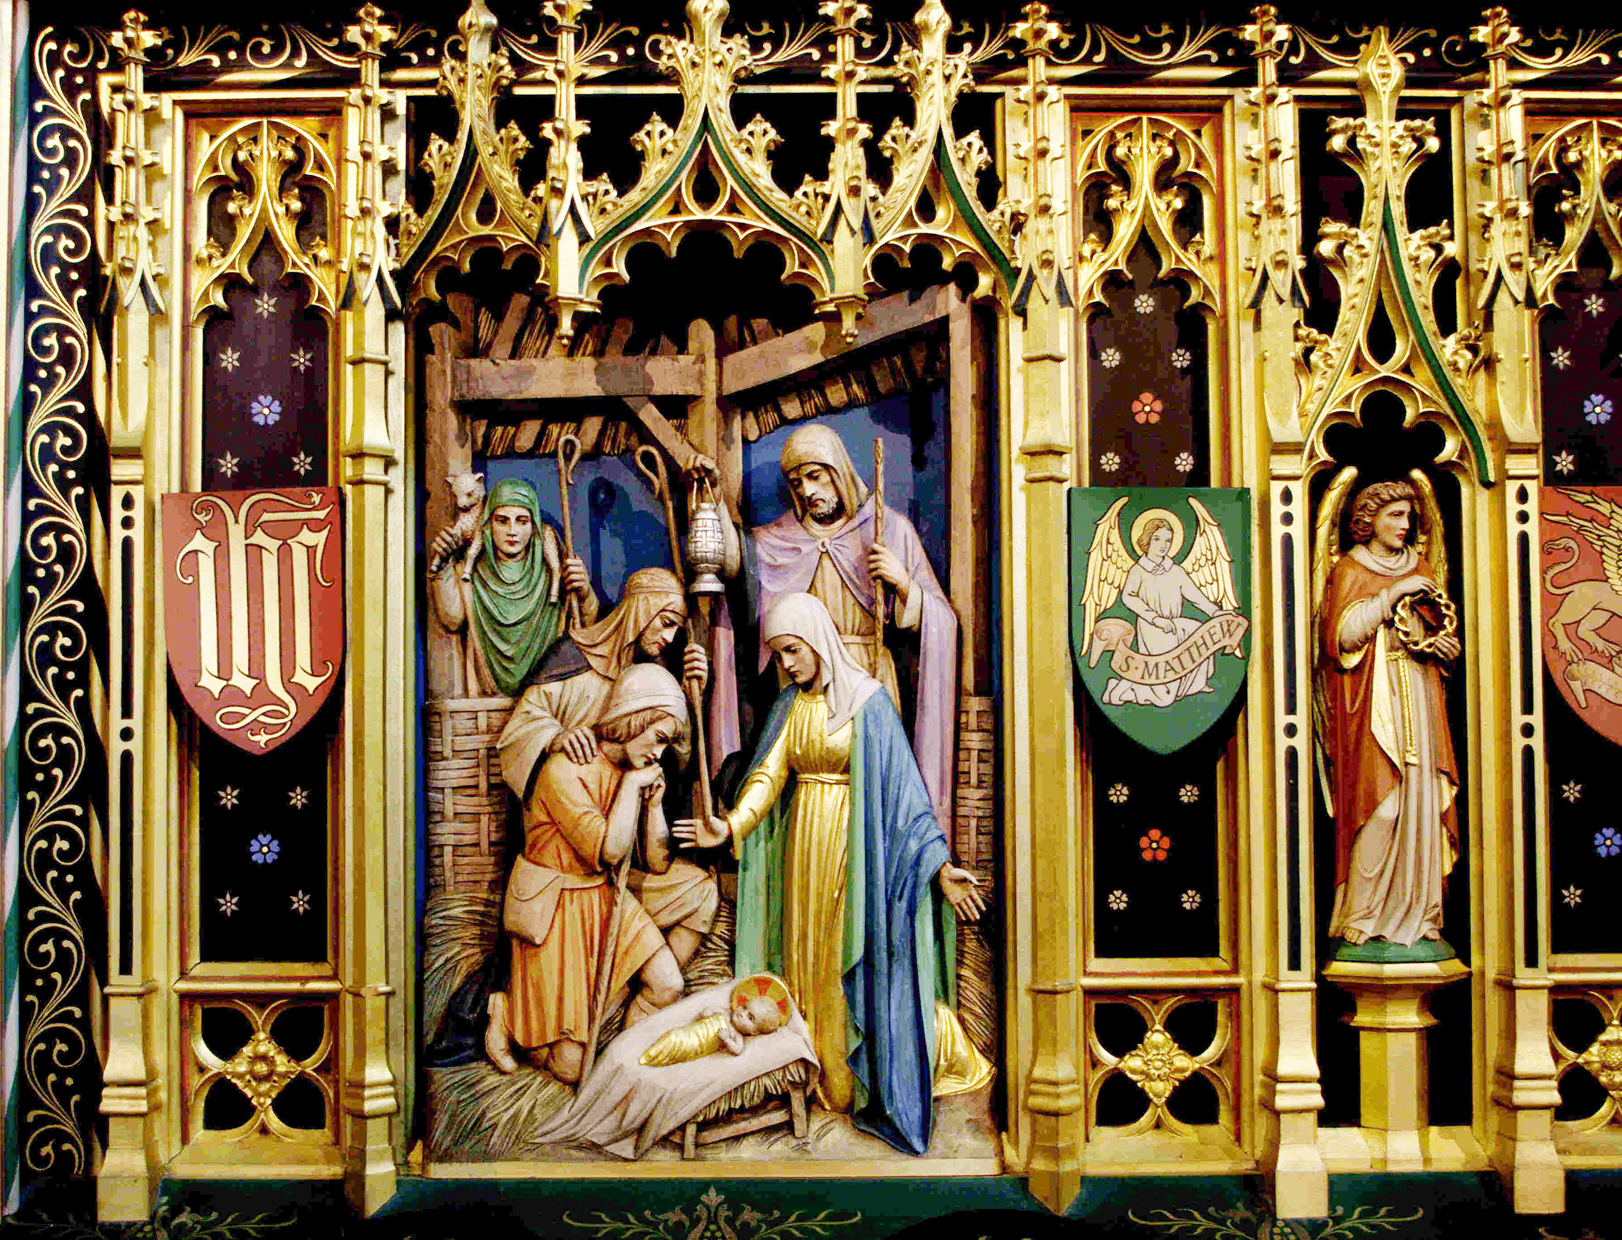 The Nativity - Rederos detail